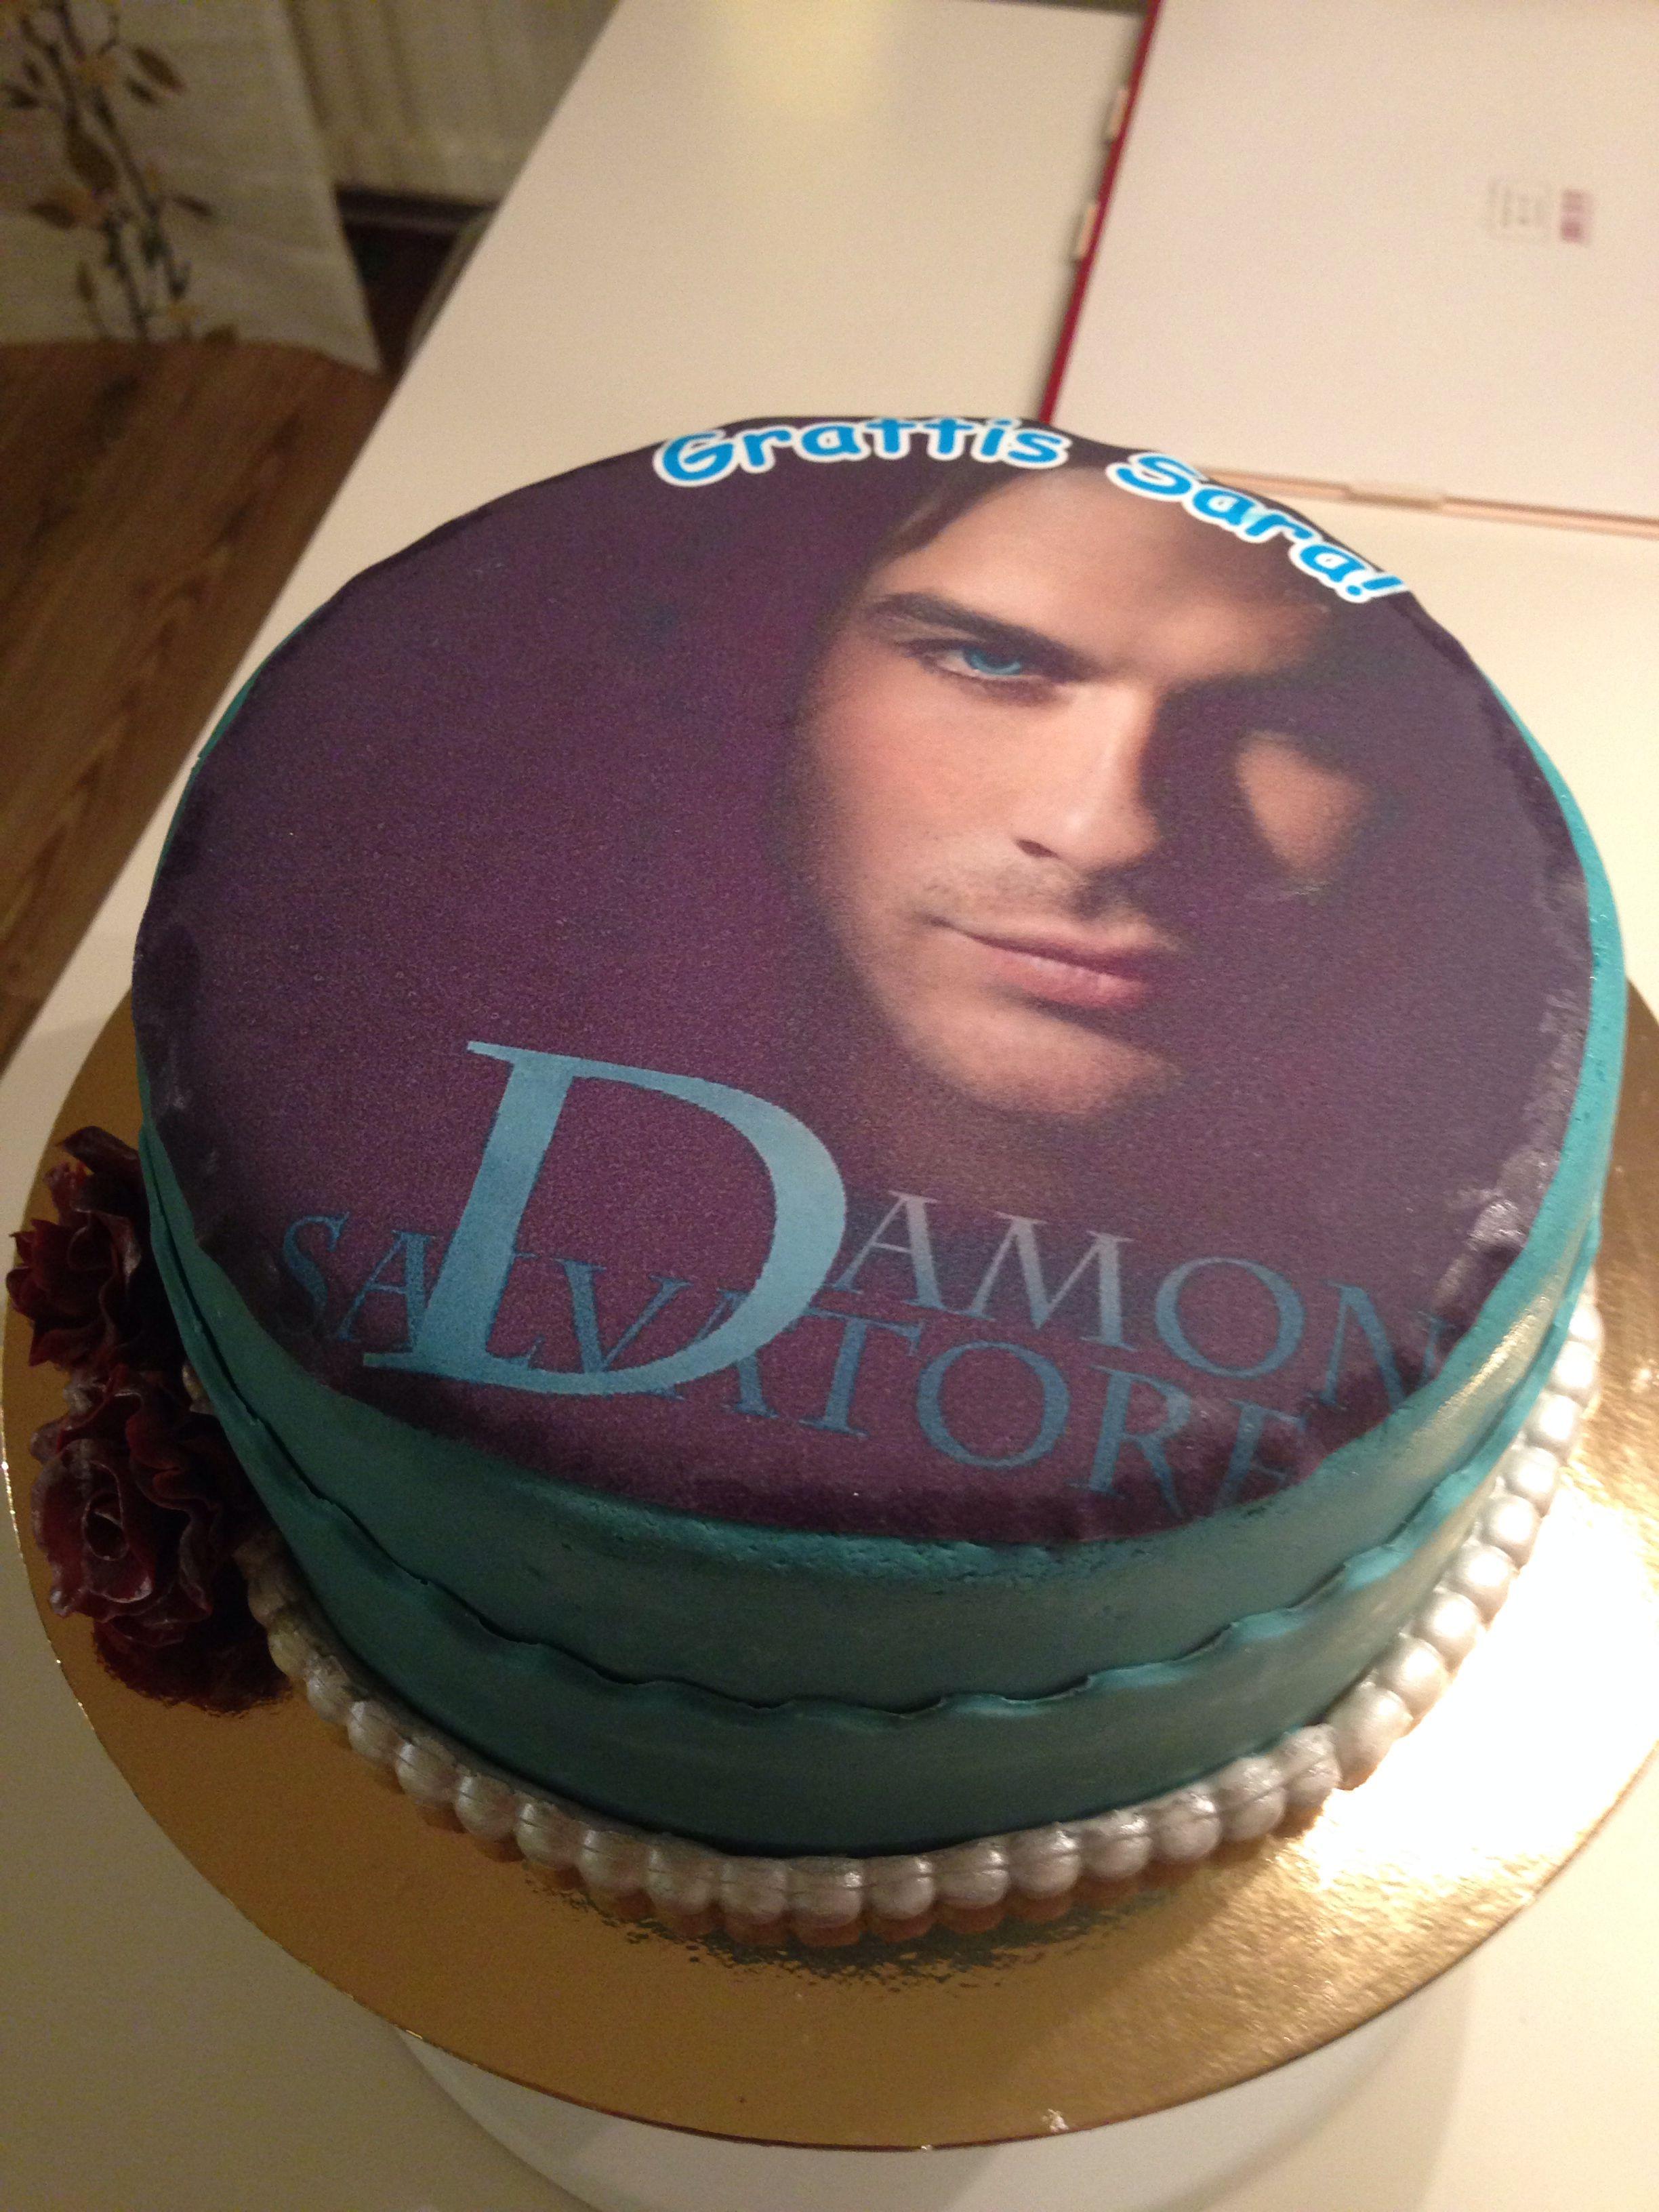 Vampire Diaries Cake Cakes Pinterest Cake Birthday Cakes And Food